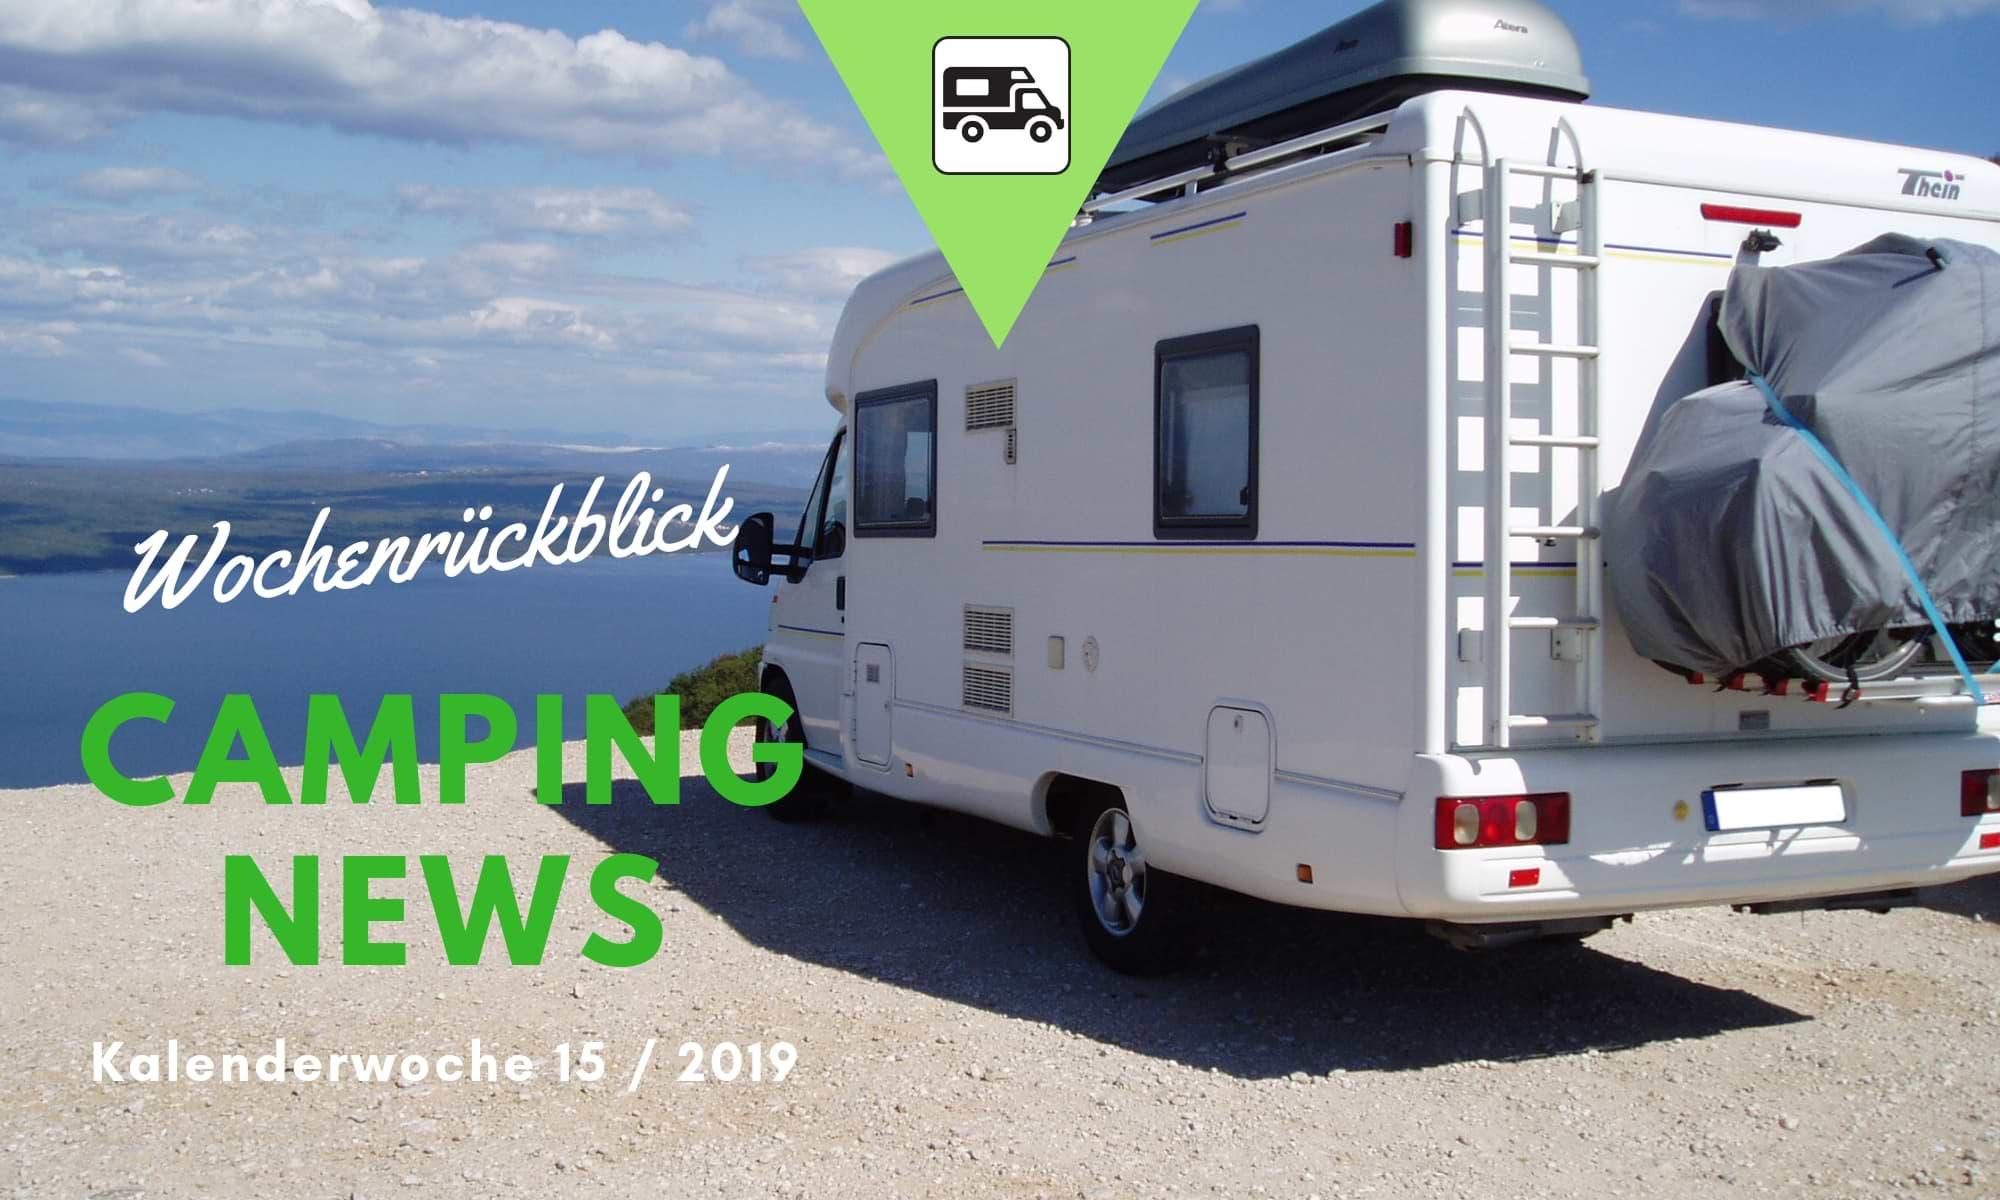 Wochenrückblick Camping News KW15-2019